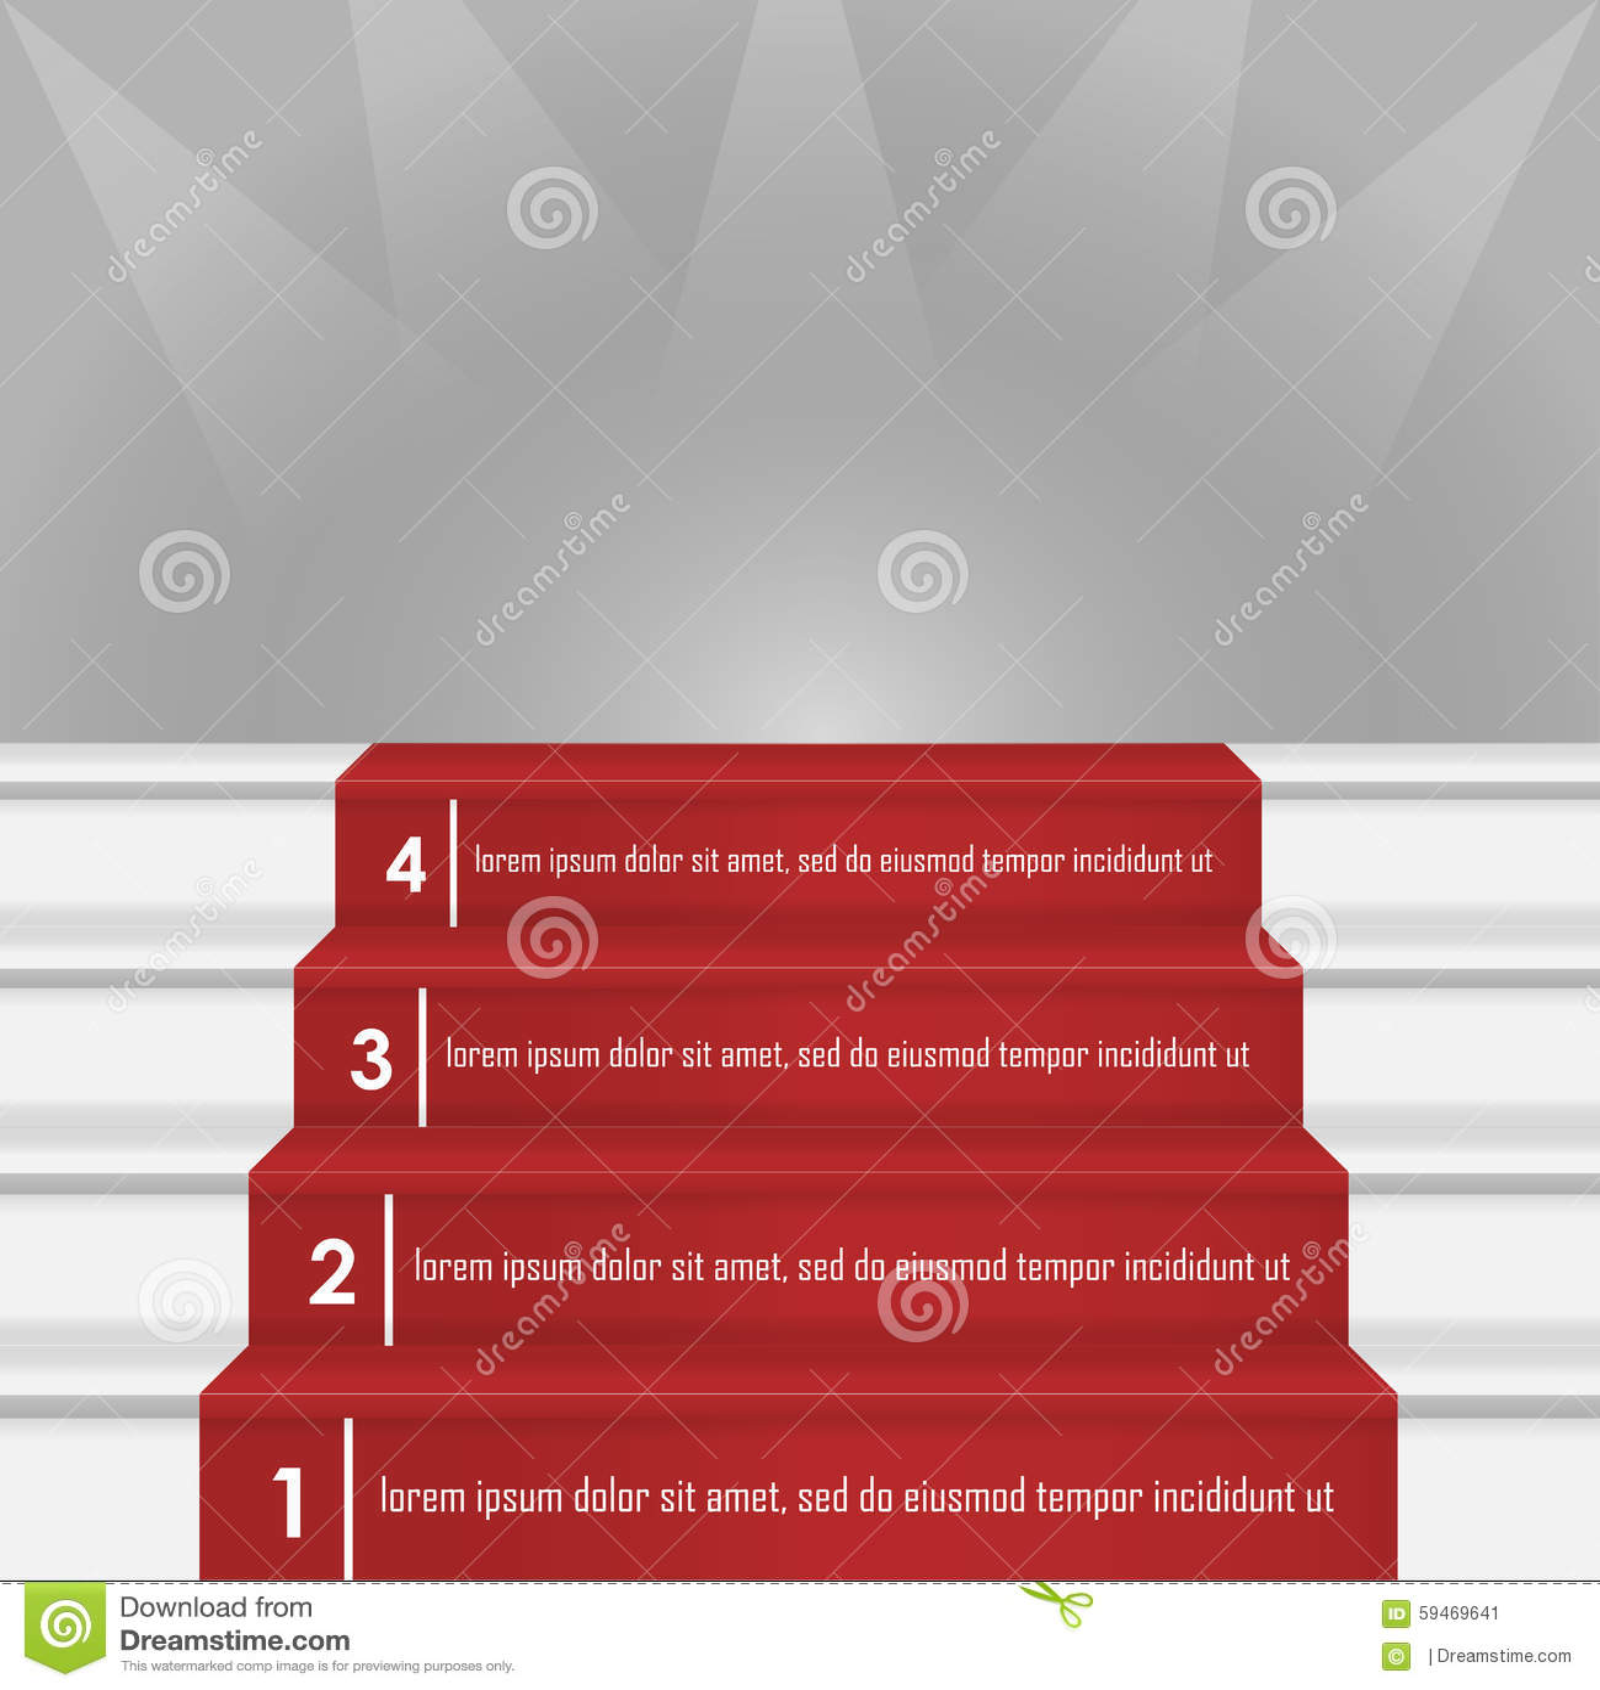 Steps To Success Image Stock Illustration - Image: 59469641